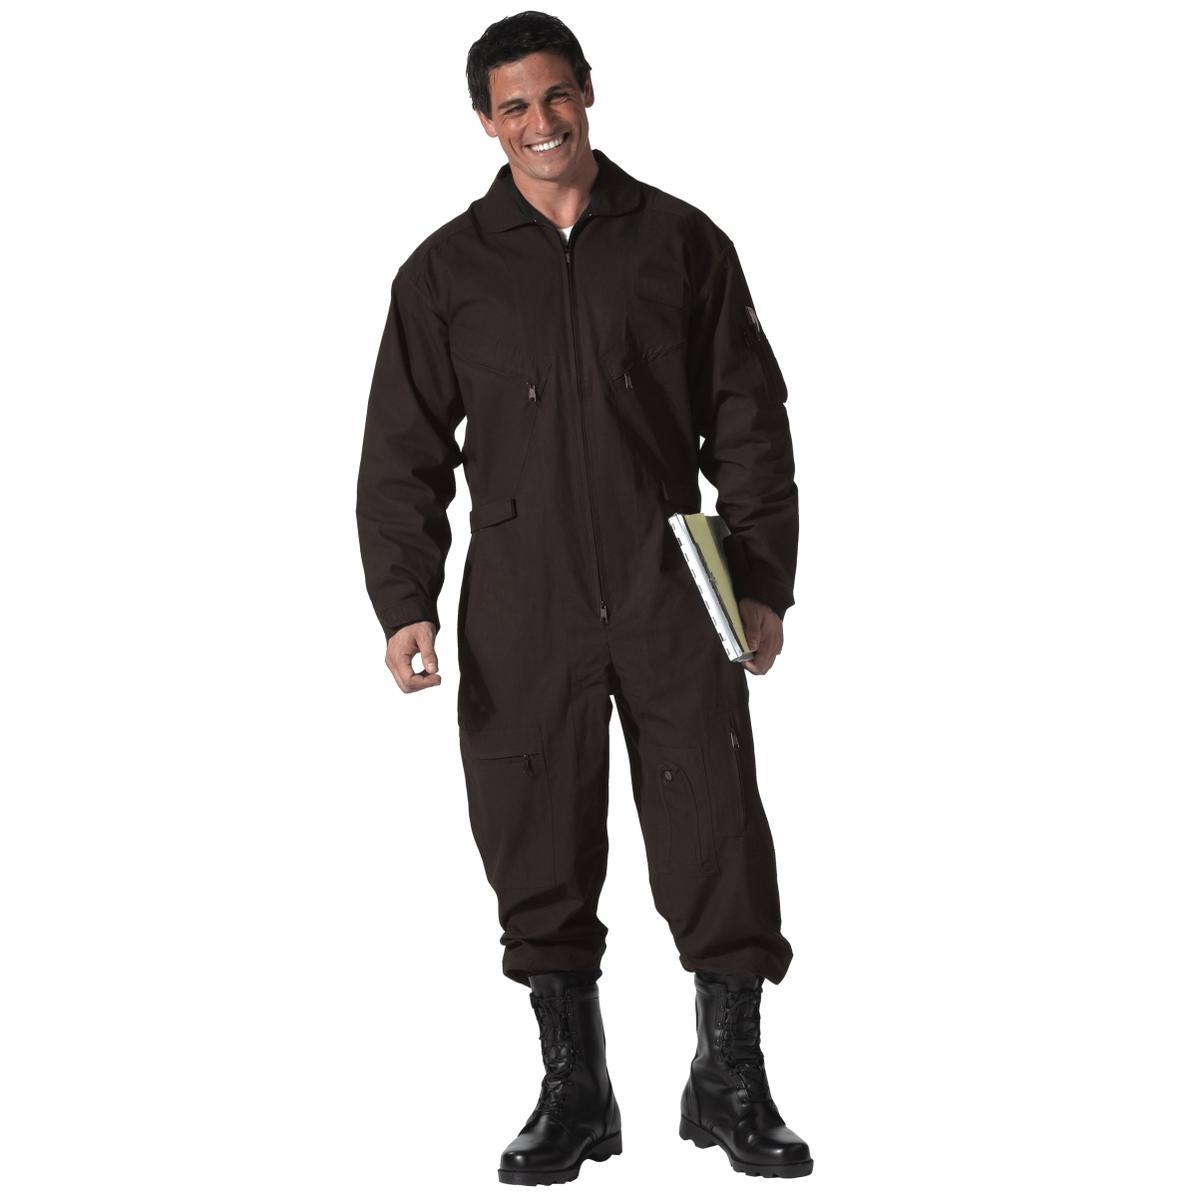 Black Air Force CWU-27P Style Flightsuit - Medium